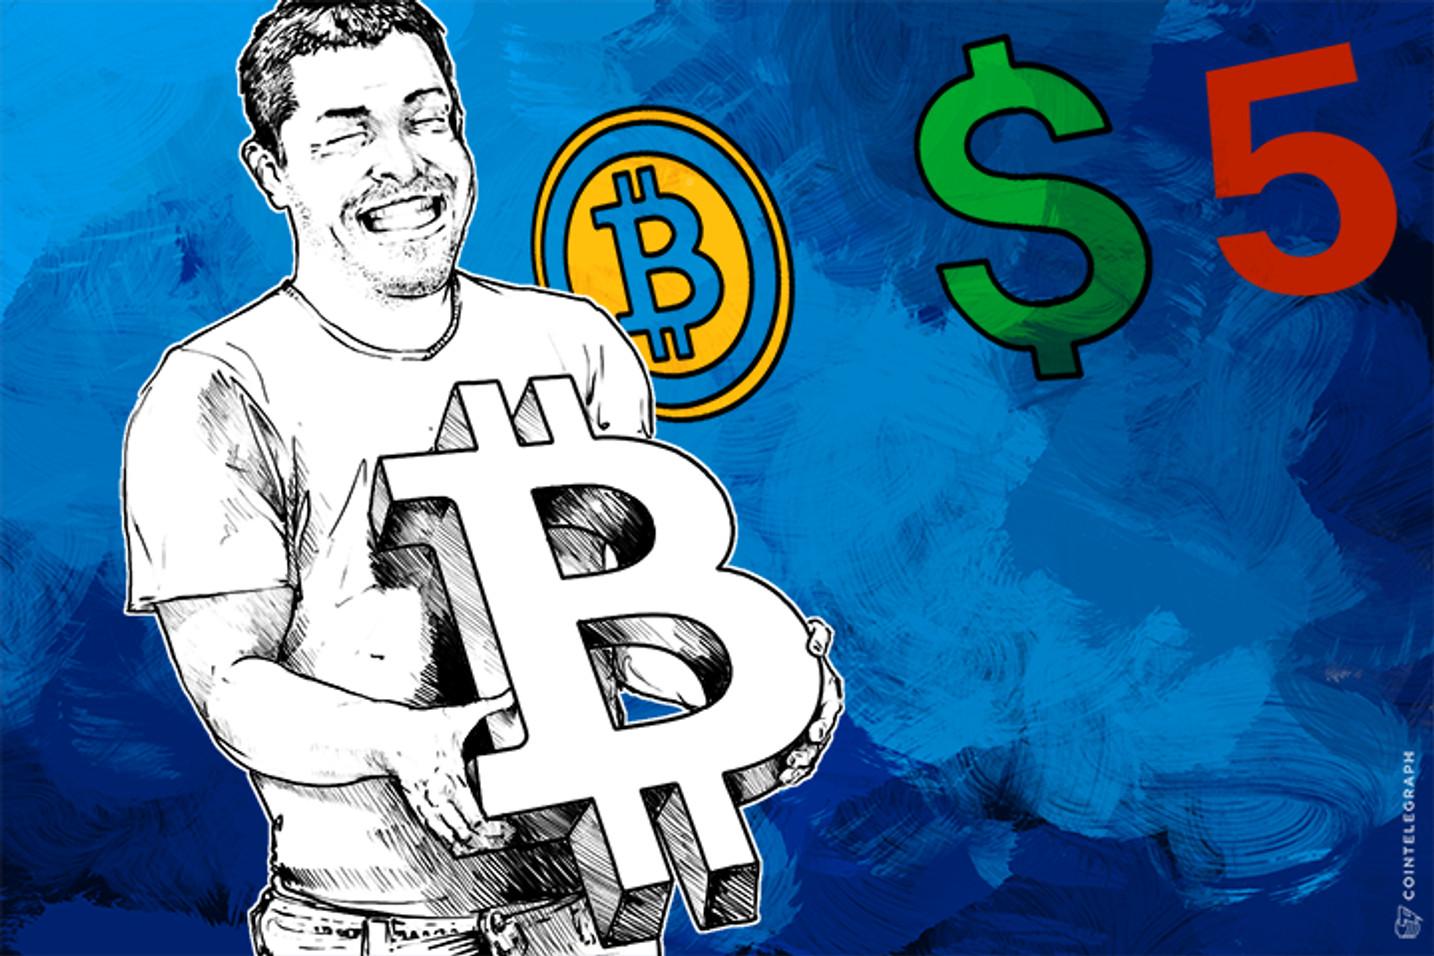 5 Reasons Why I'd Still Use $5 Bitcoins (Op-Ed)